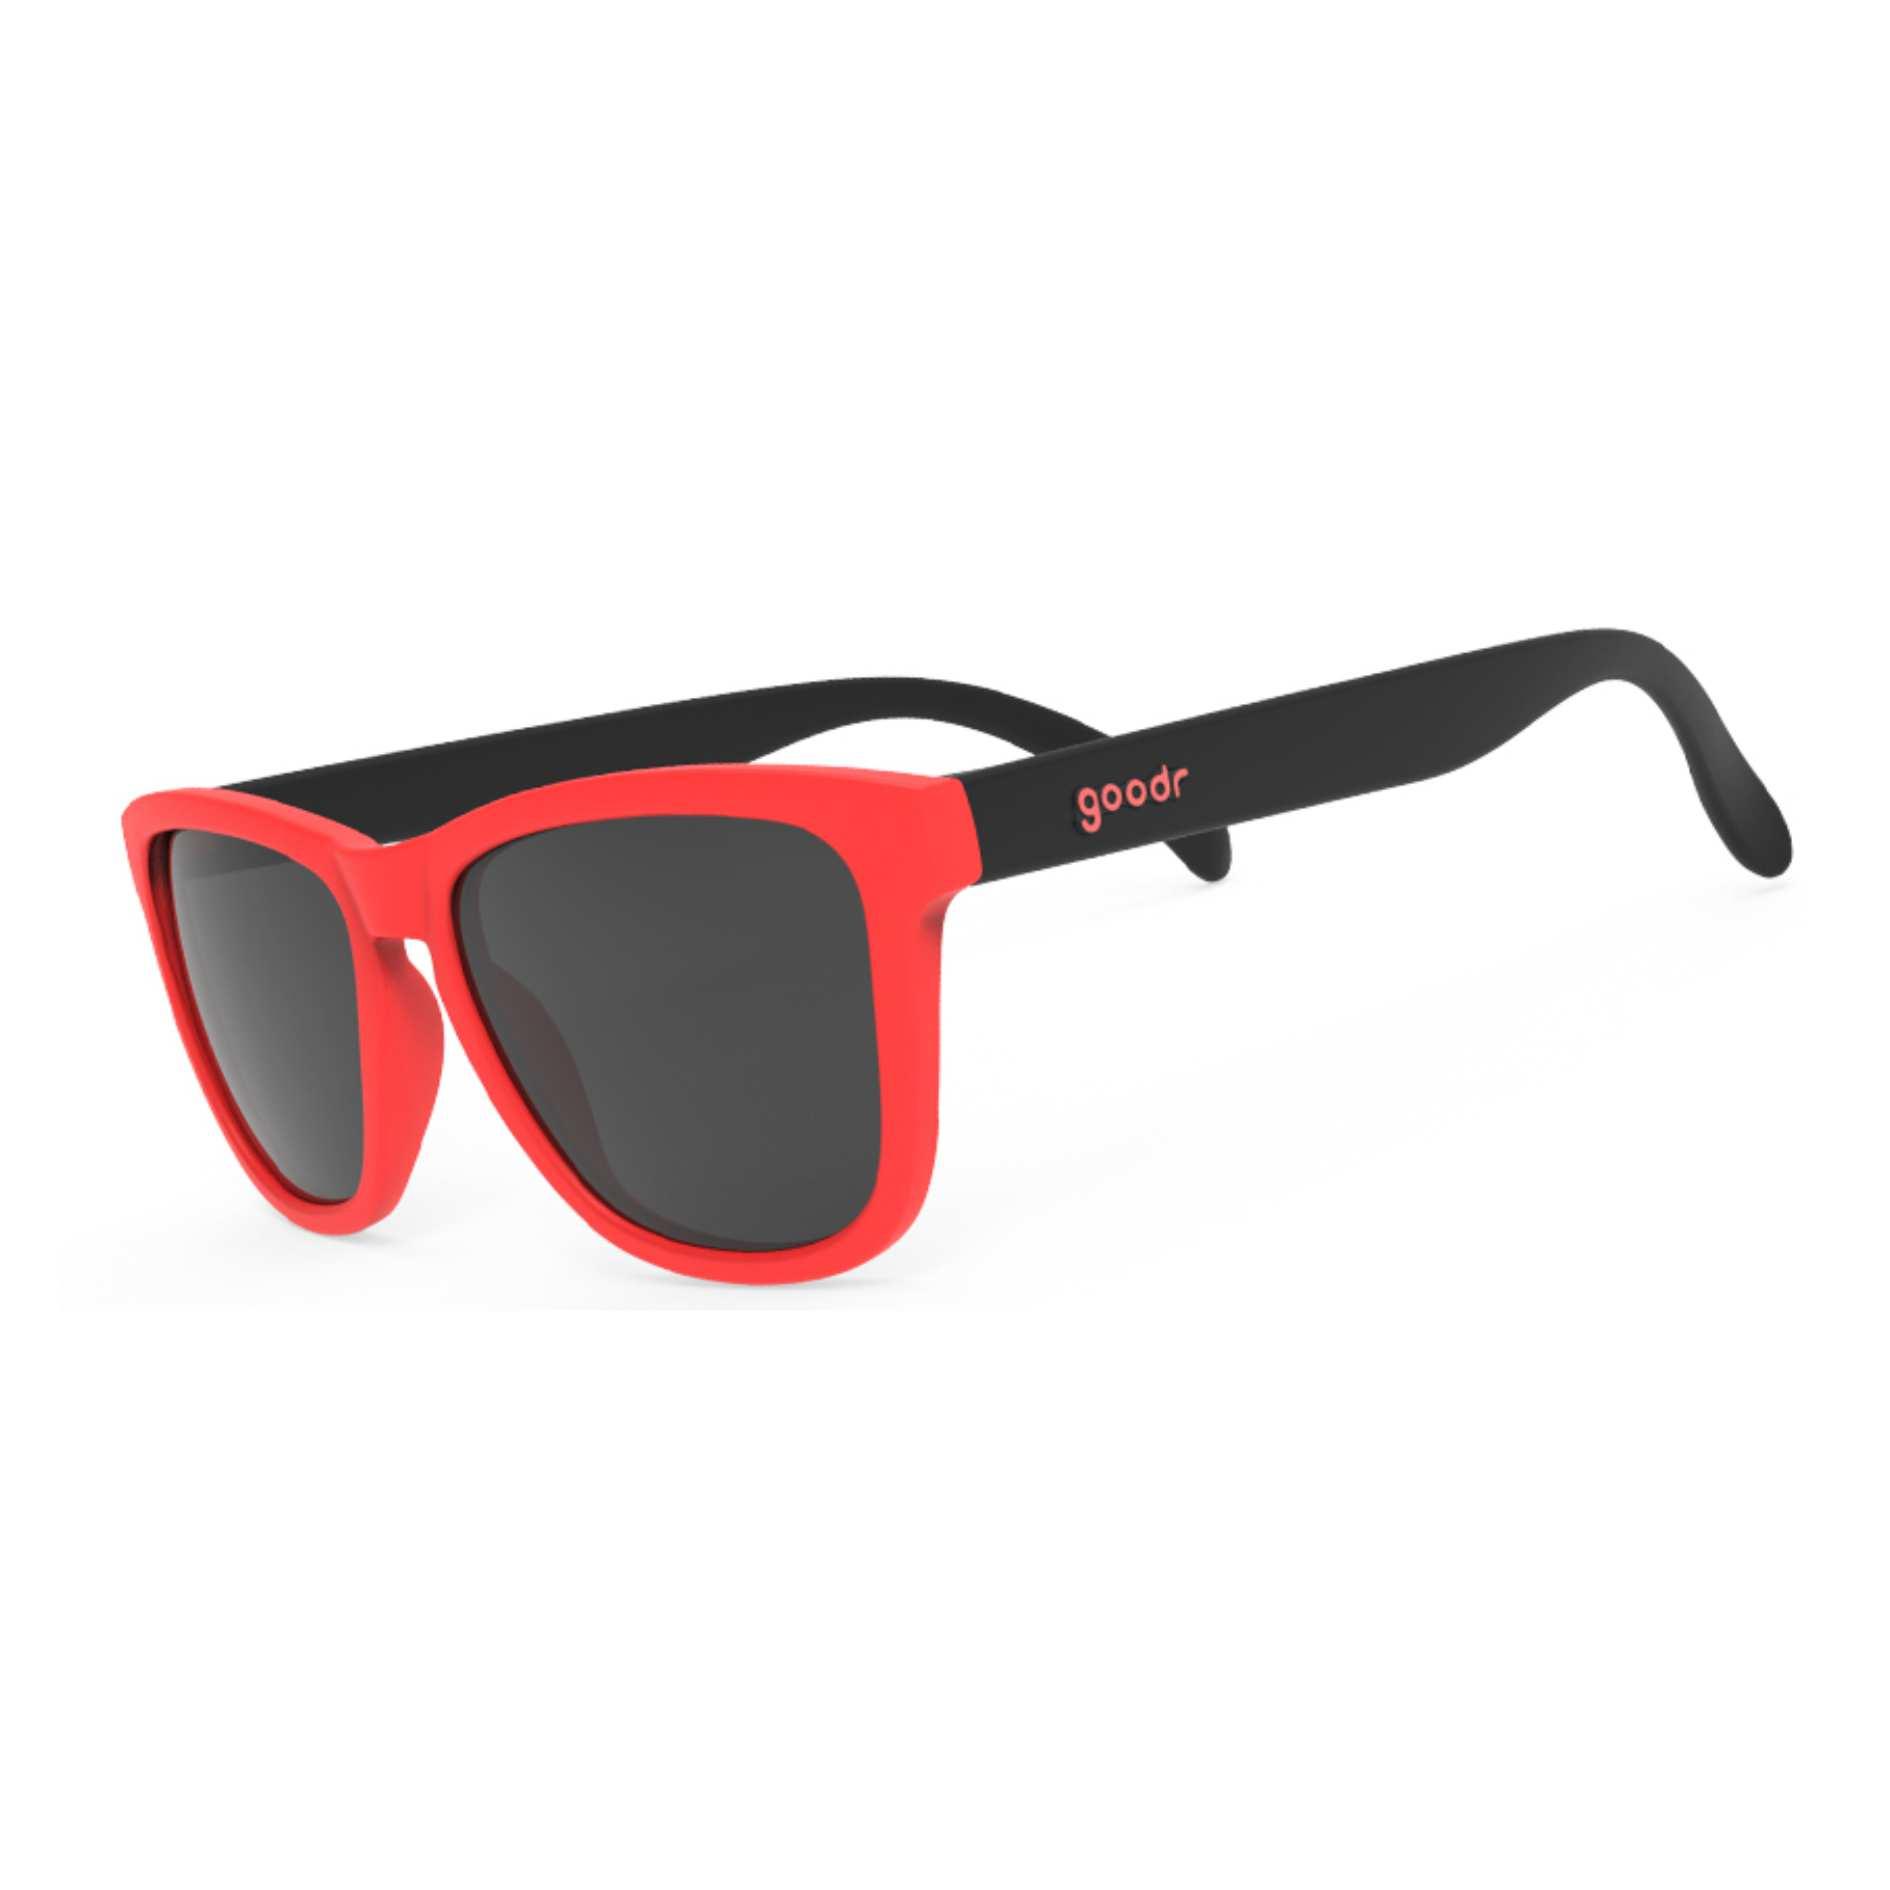 Óculos de Sol Goodr - Running - THIS IS SPARTA!!!! (it's not)